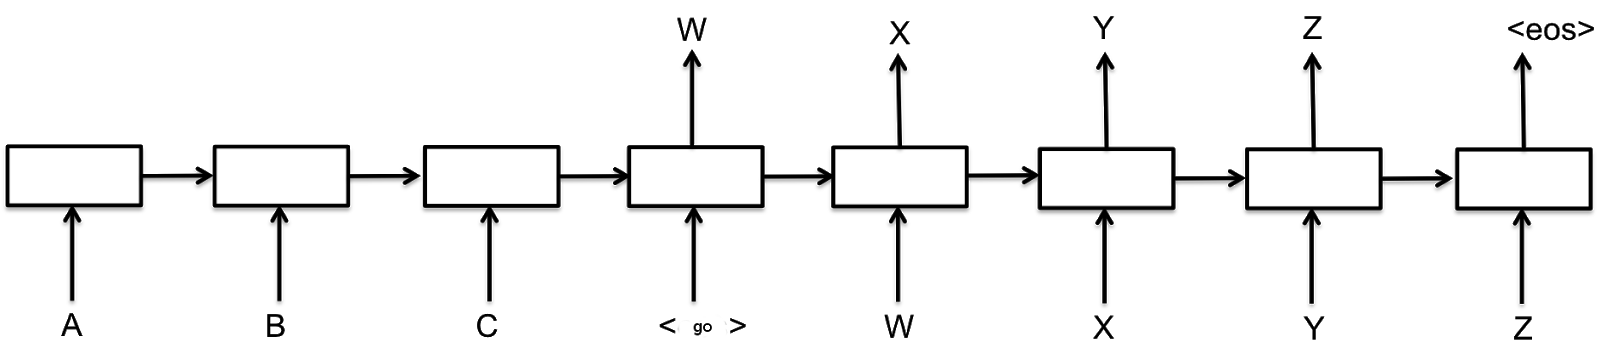 Модели Sequence-to-Sequence Ч.1 - 2